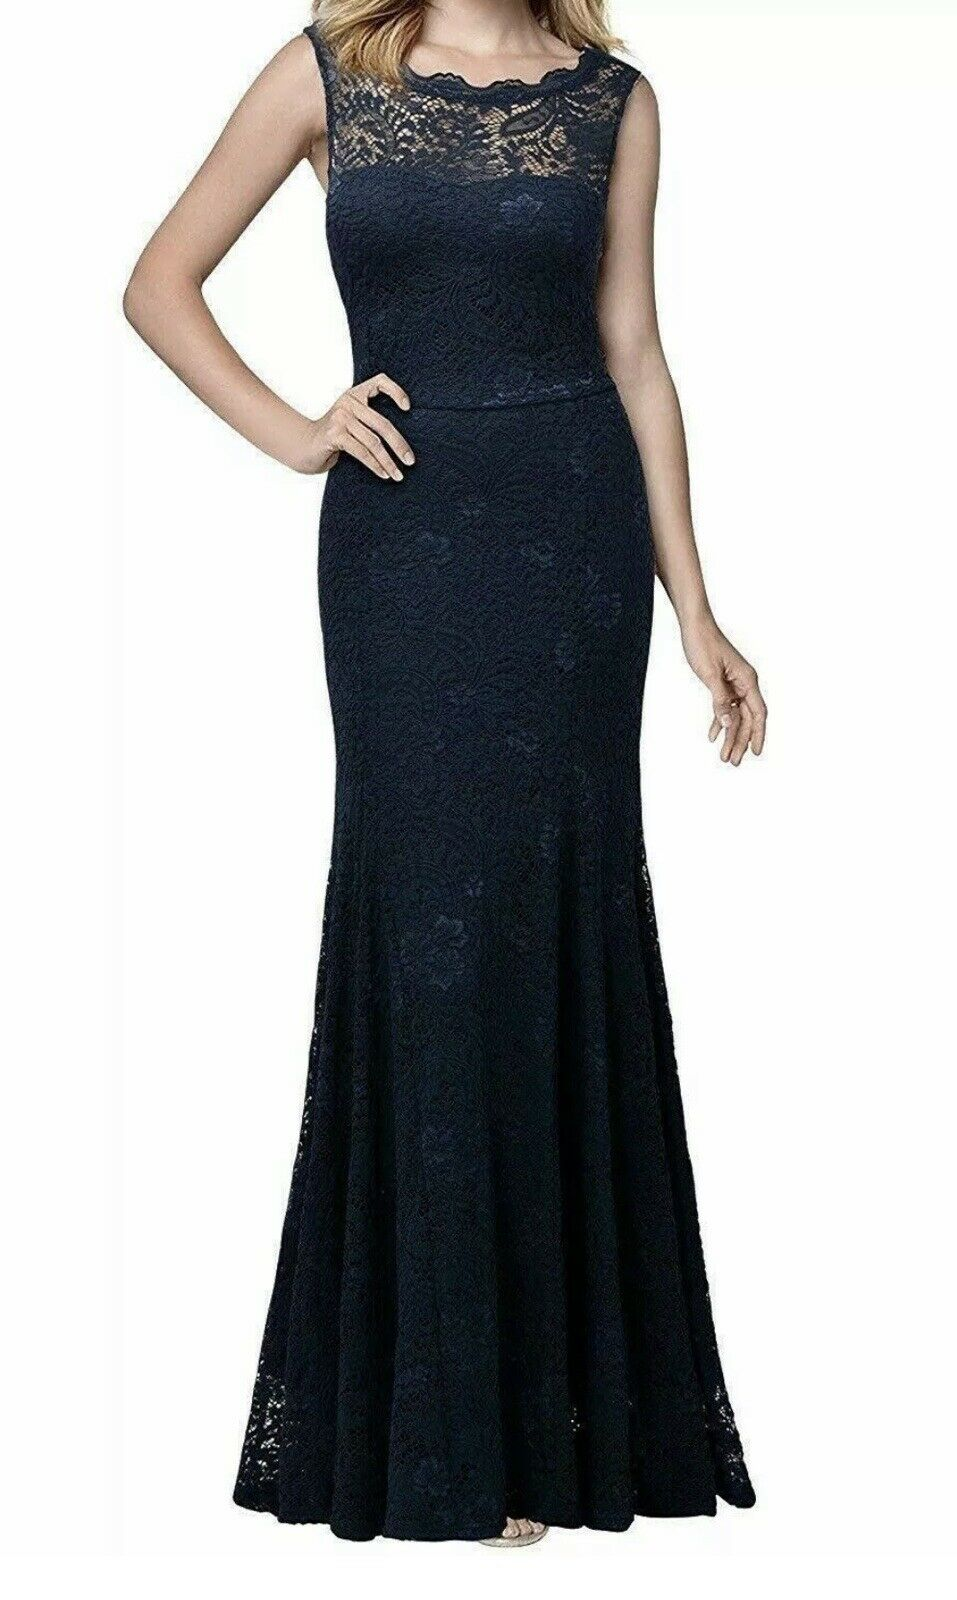 Women's Formal Plus Size XXL Navy Blue Lace Mother of the Bride MIUSOL #C186